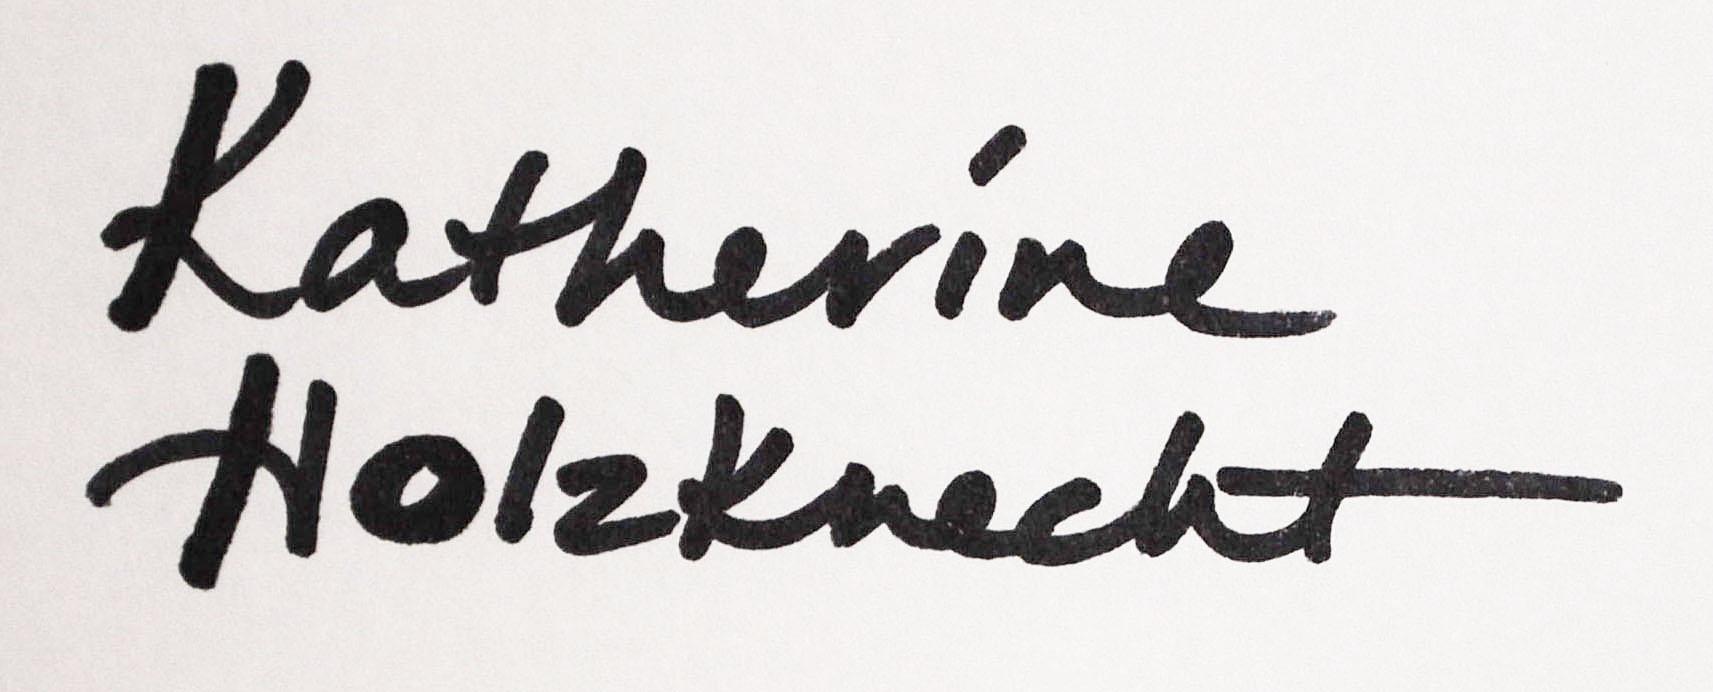 KH ARTISTE's Signature